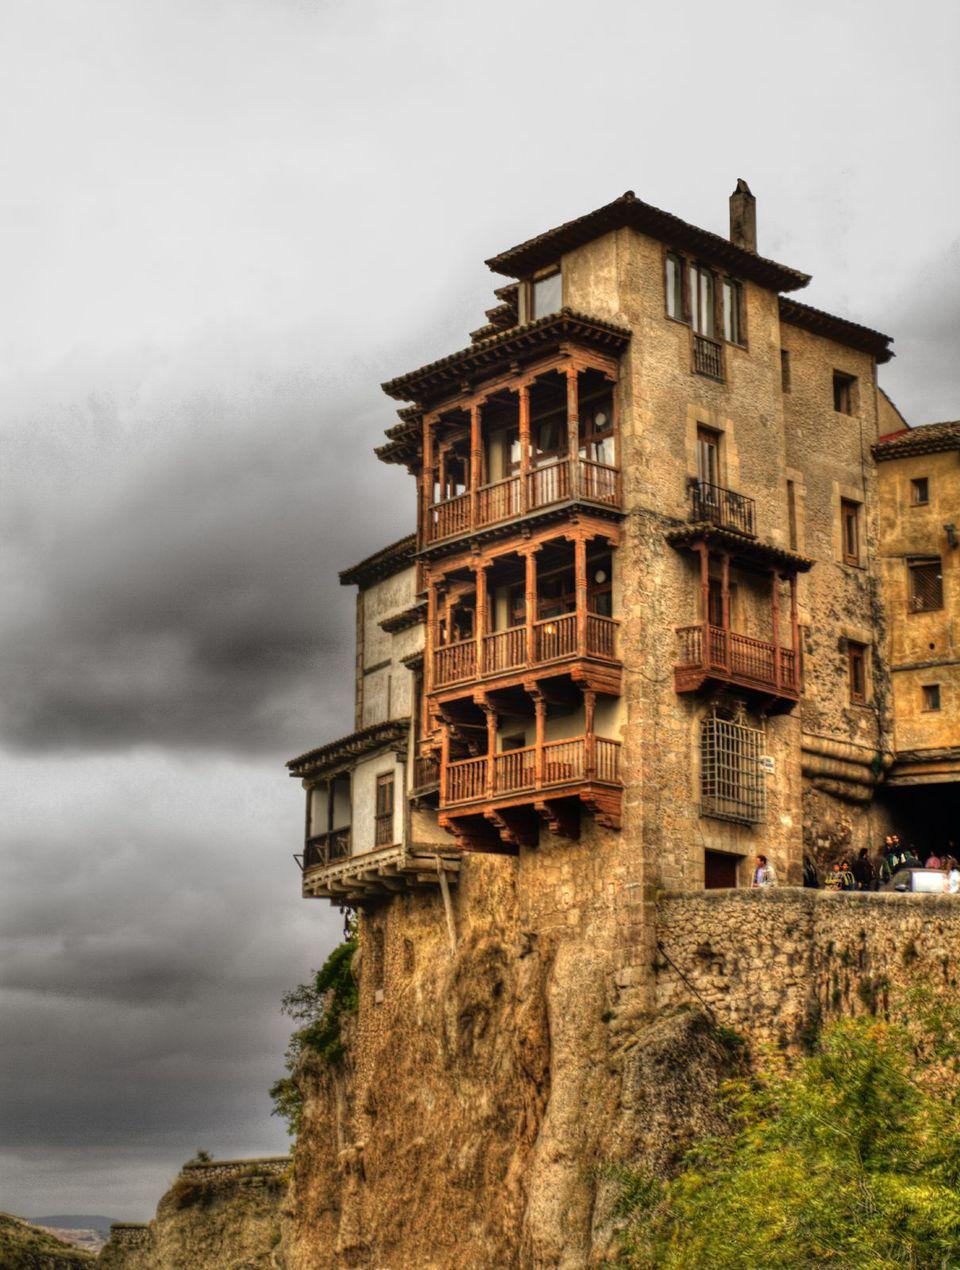 Hanging Houses in Cuenca